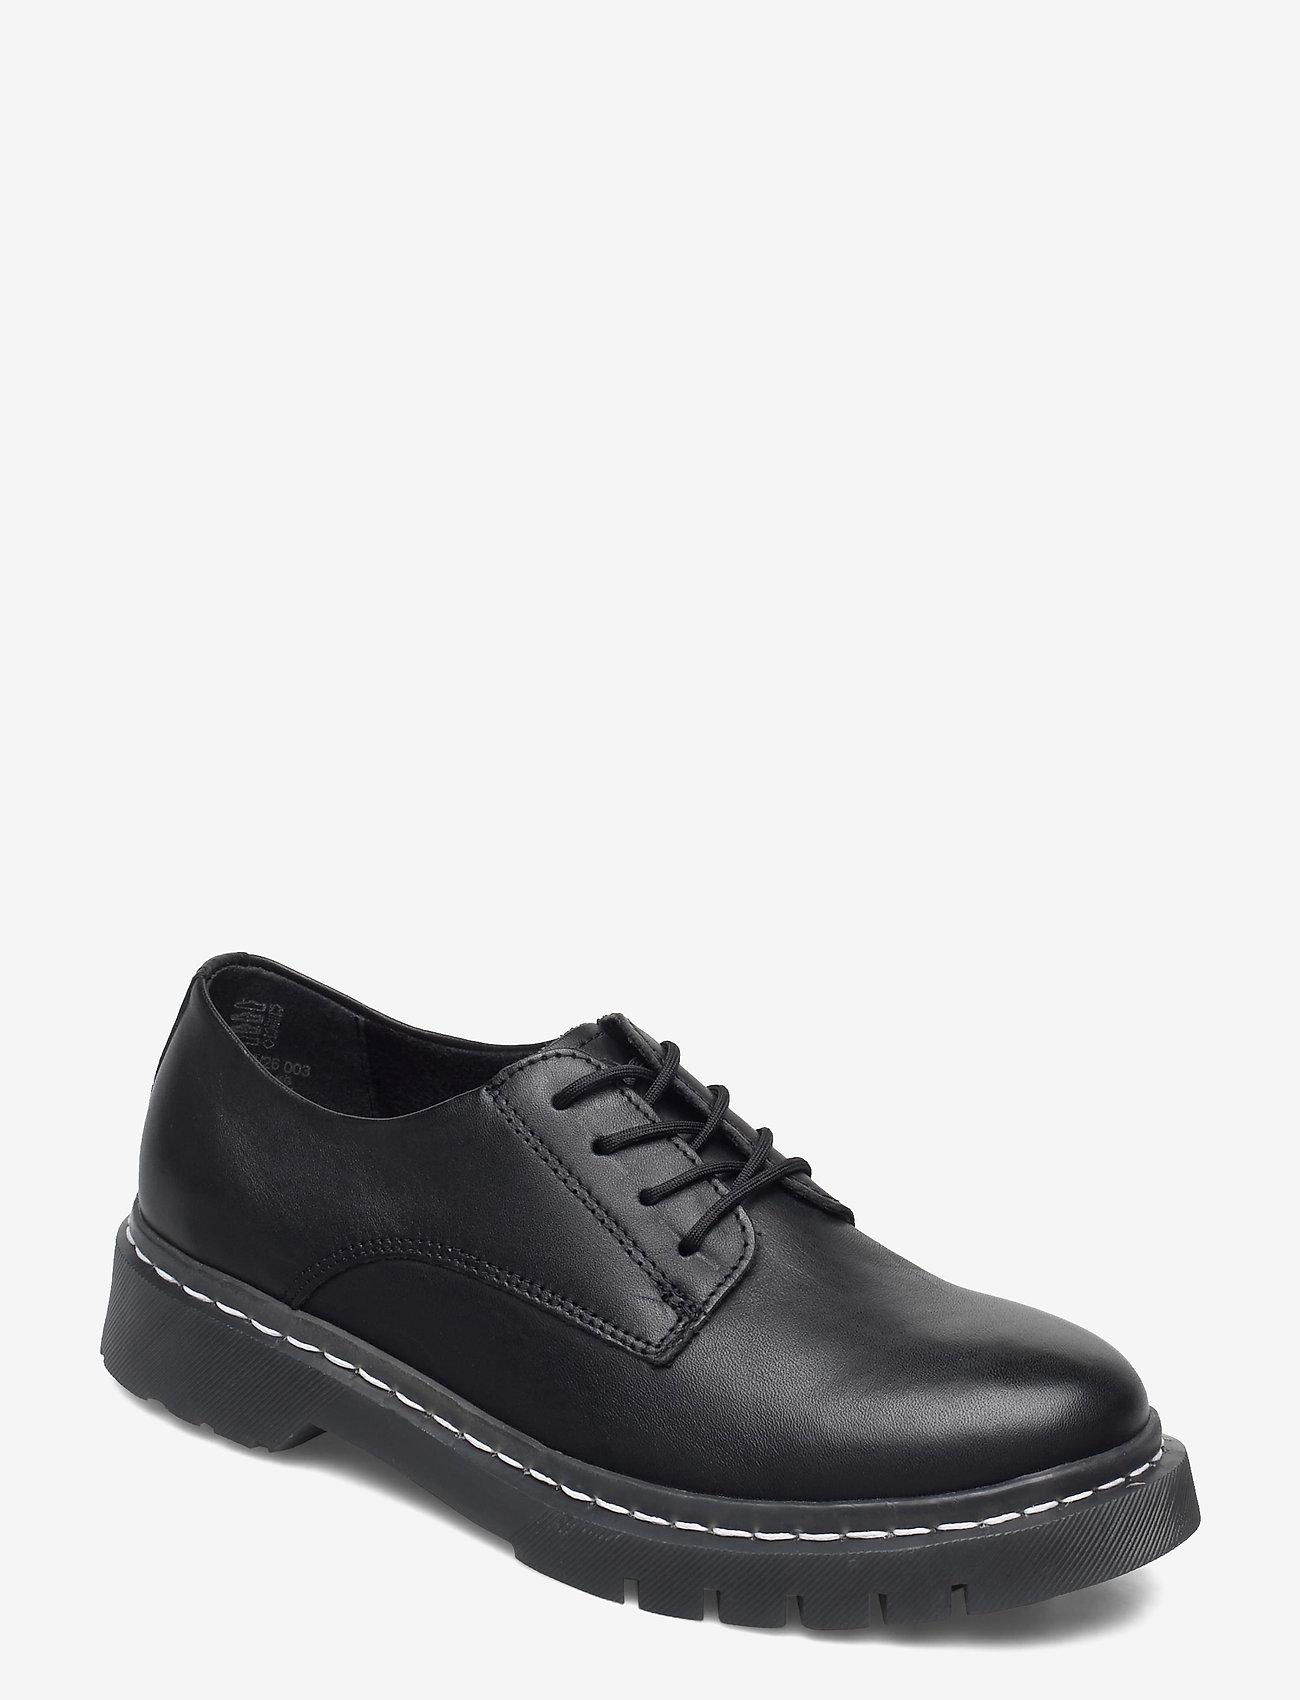 Tamaris - Woms Lace-up - schnürschuhe - black leather - 0